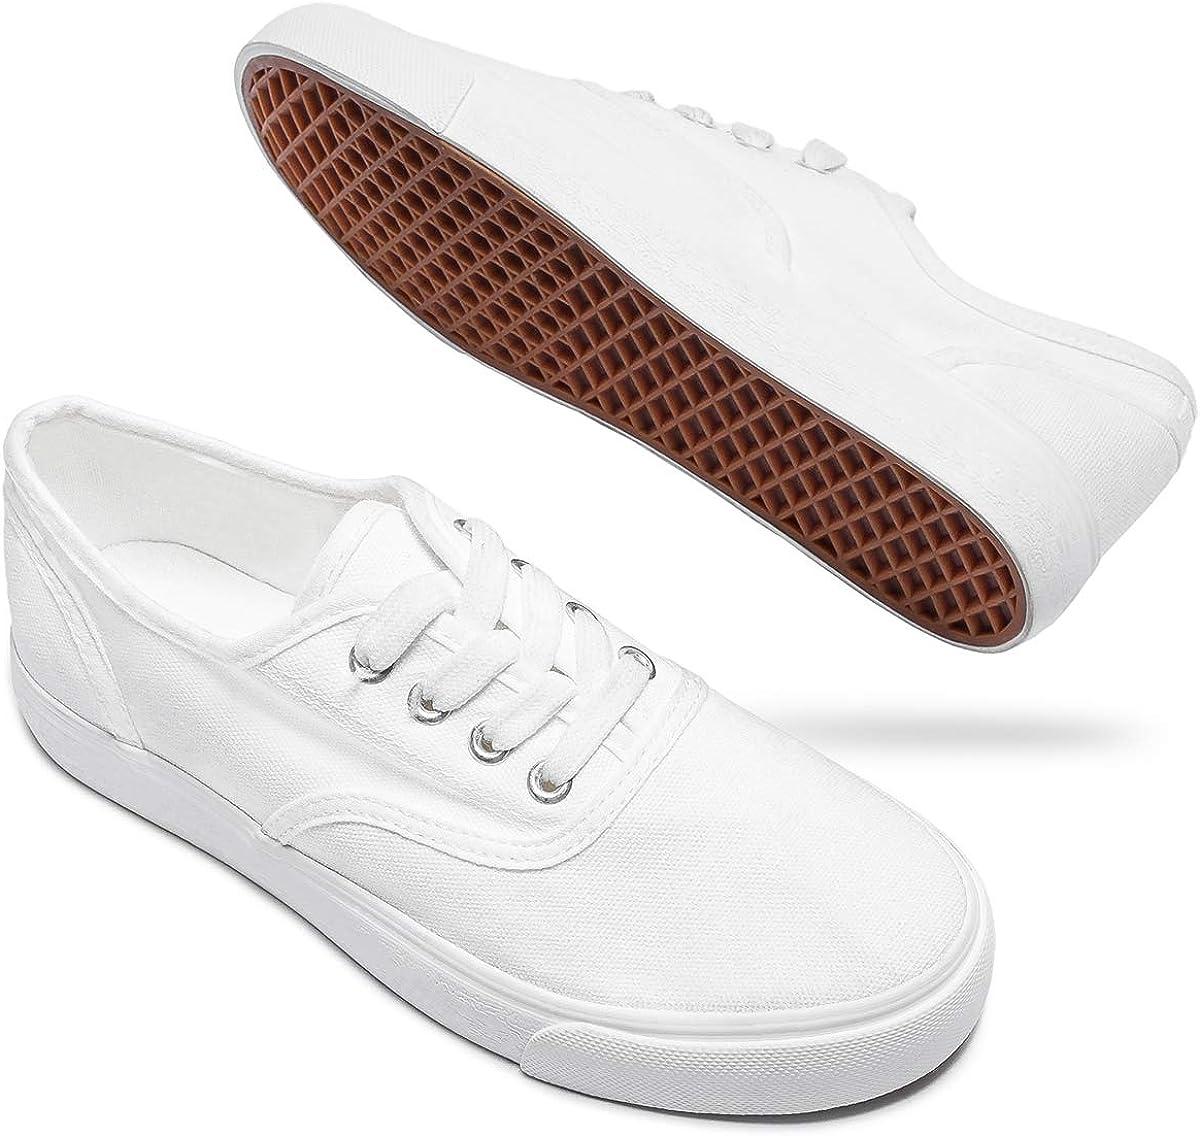 AOMAIS Womens White Canvas Shoes Casual